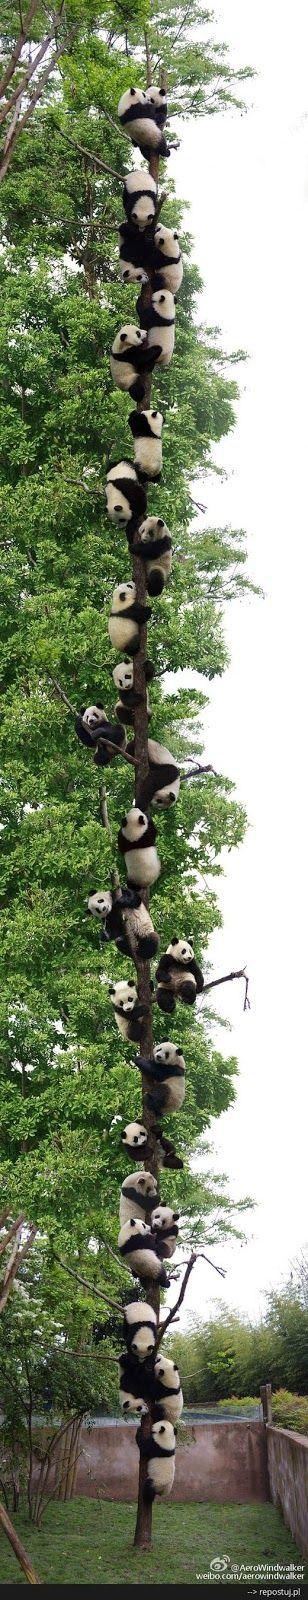 Baby Pandas climbing tree Animals Wallpapers Pets and Animals